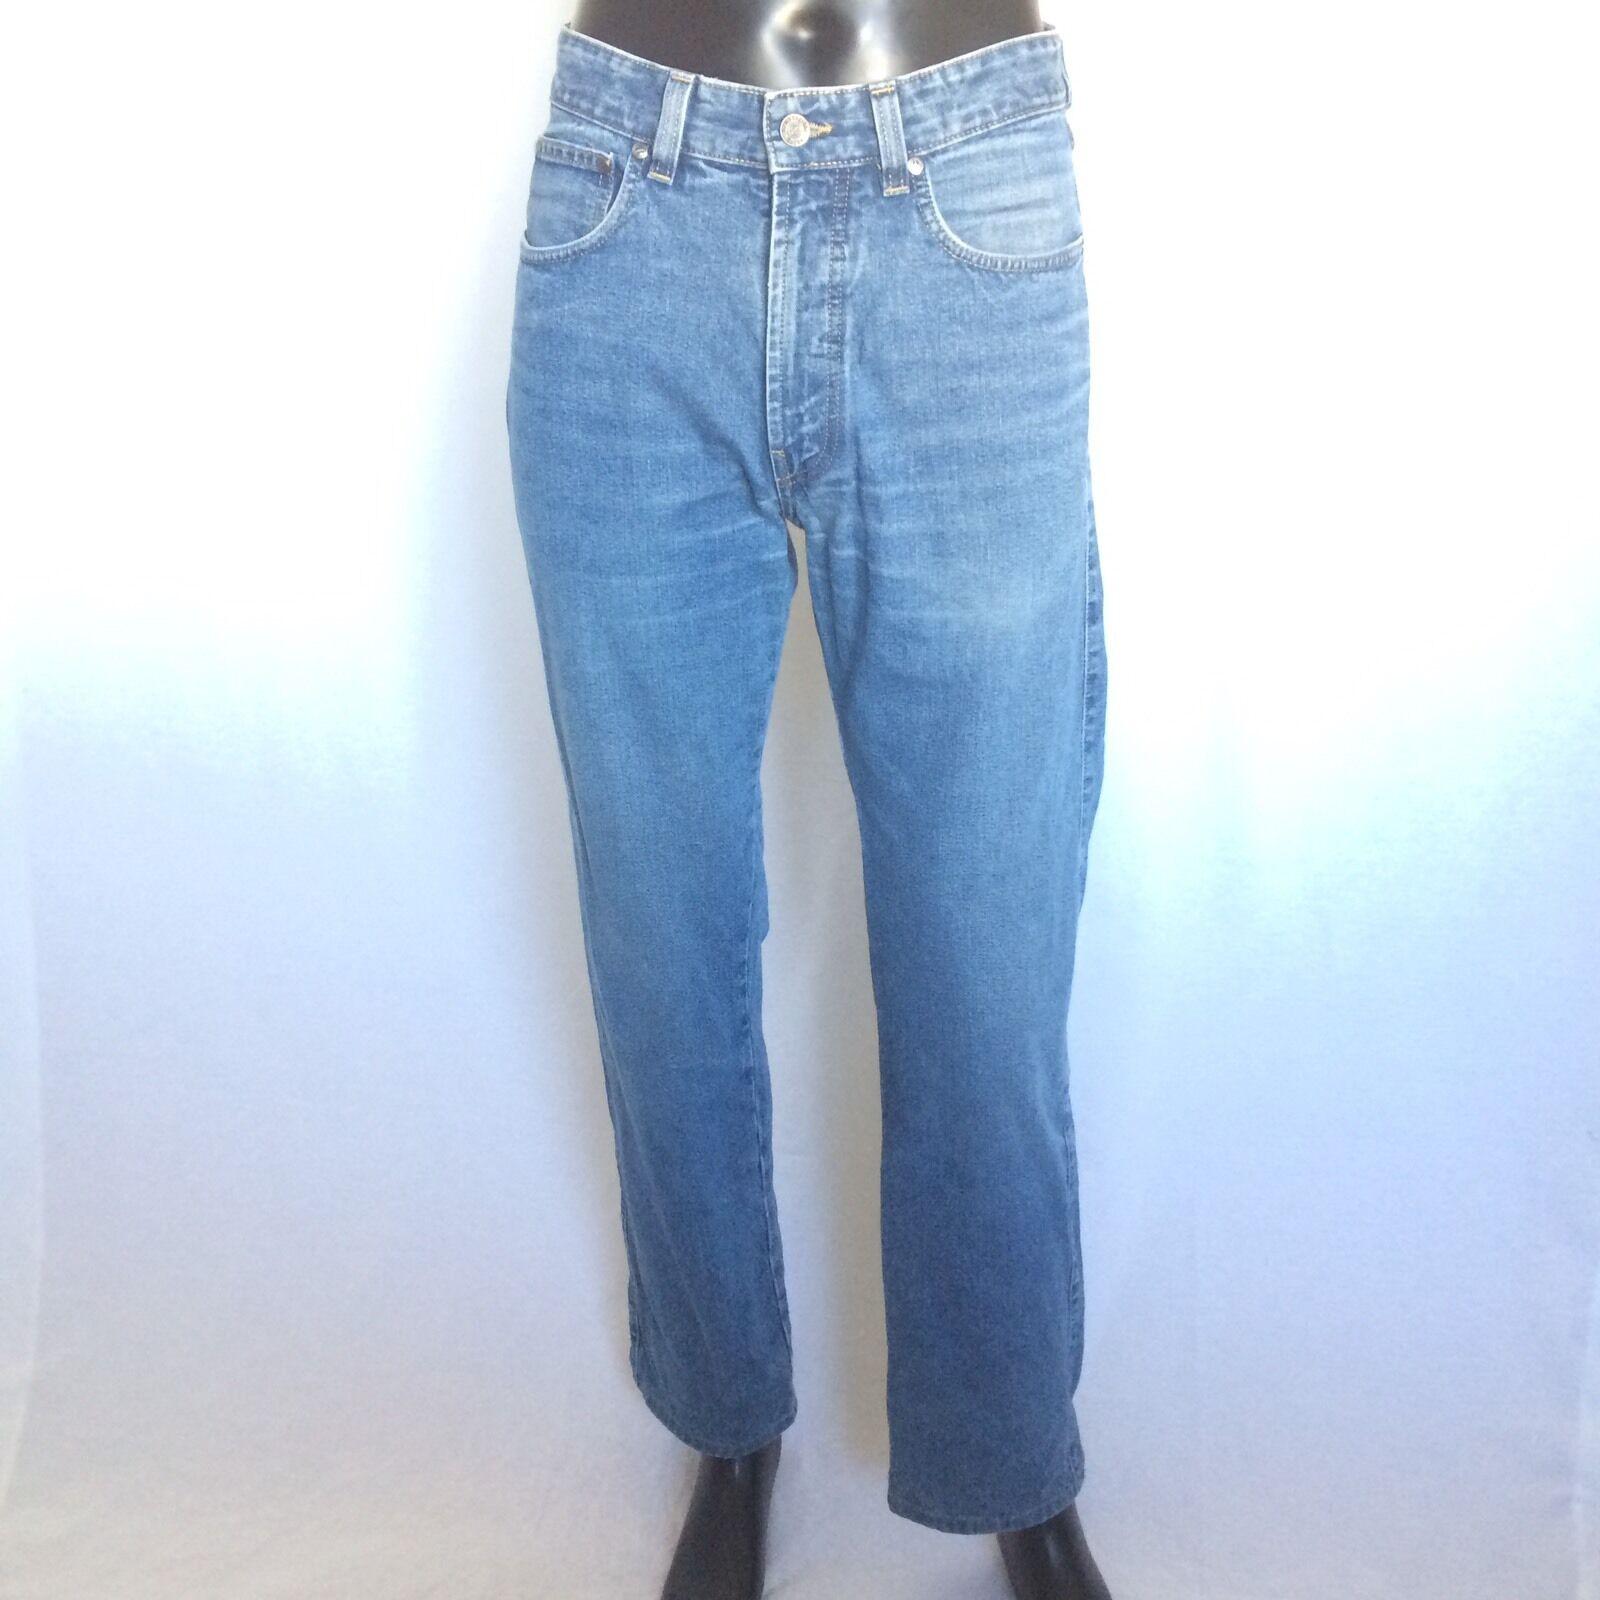 Ermenegildo Zegna Mens Designer Jeans Size 32 x 32 Straight Leg  Denim bluee